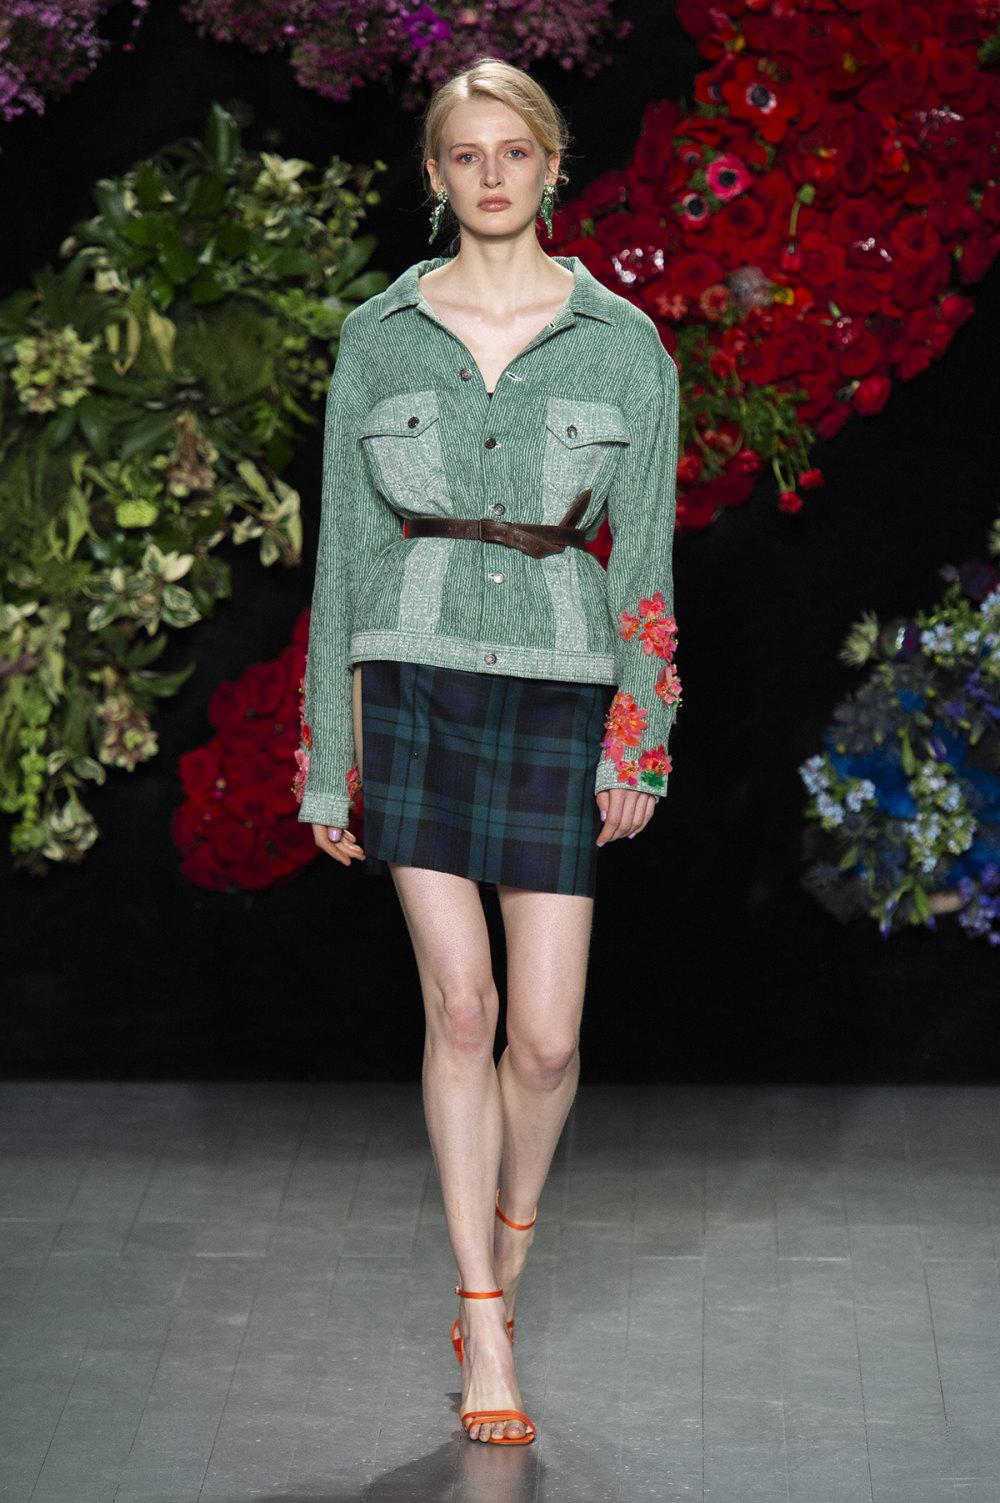 Roberta Einer时装系列格子呢西装外套收紧腰部霓虹色腰带连帽衫-17.jpg